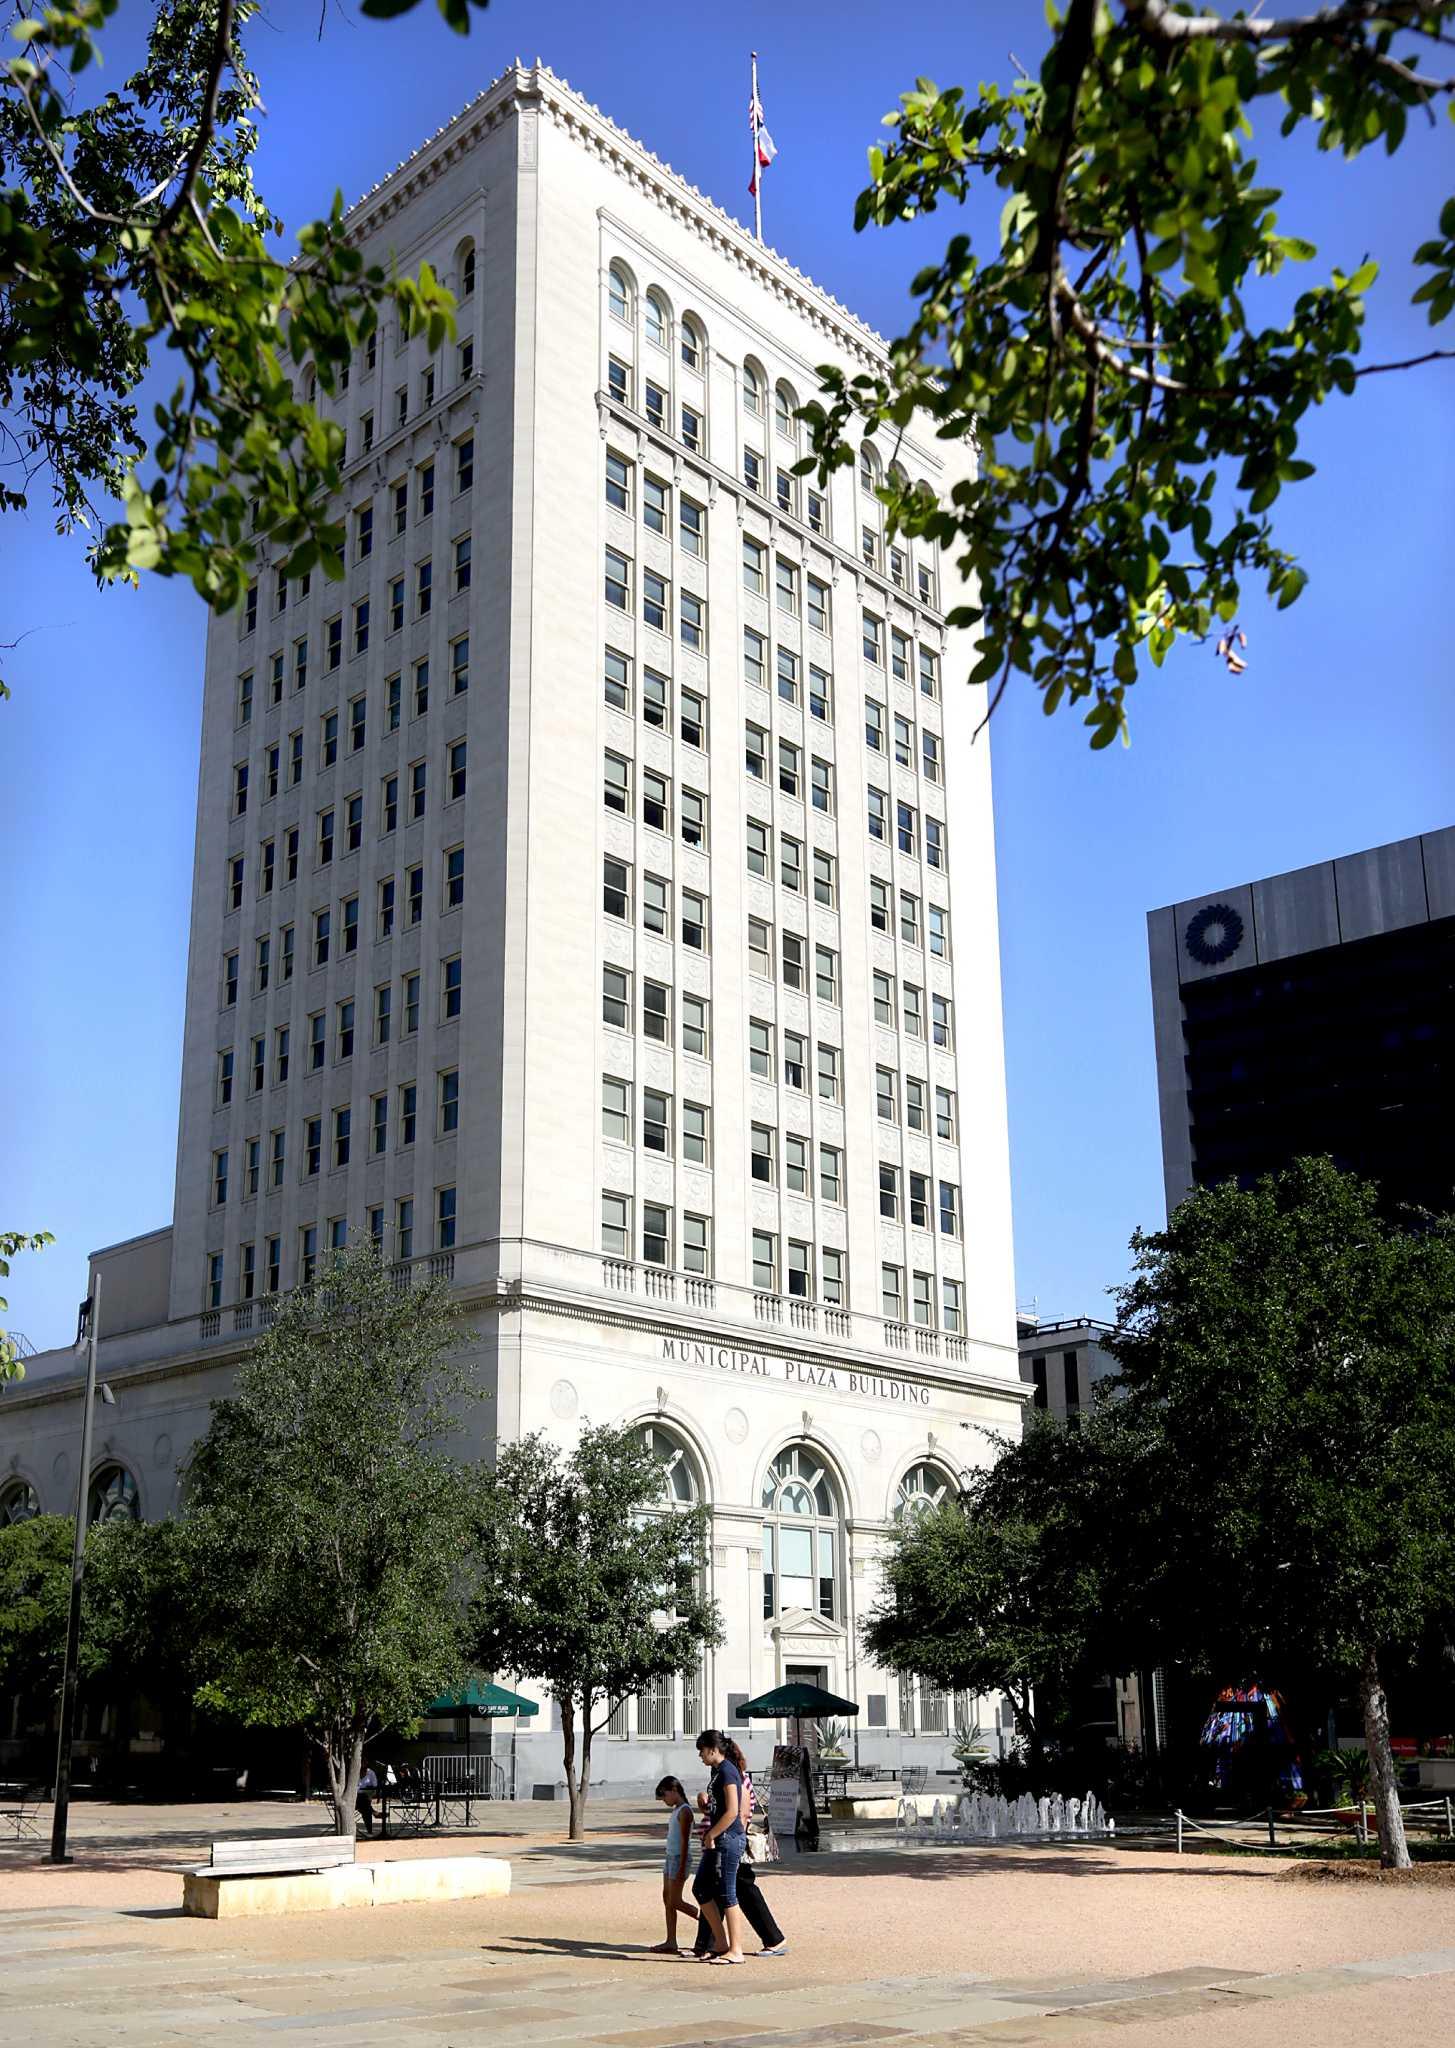 Cityscape: Municipal Plaza Building - San Antonio Express-News